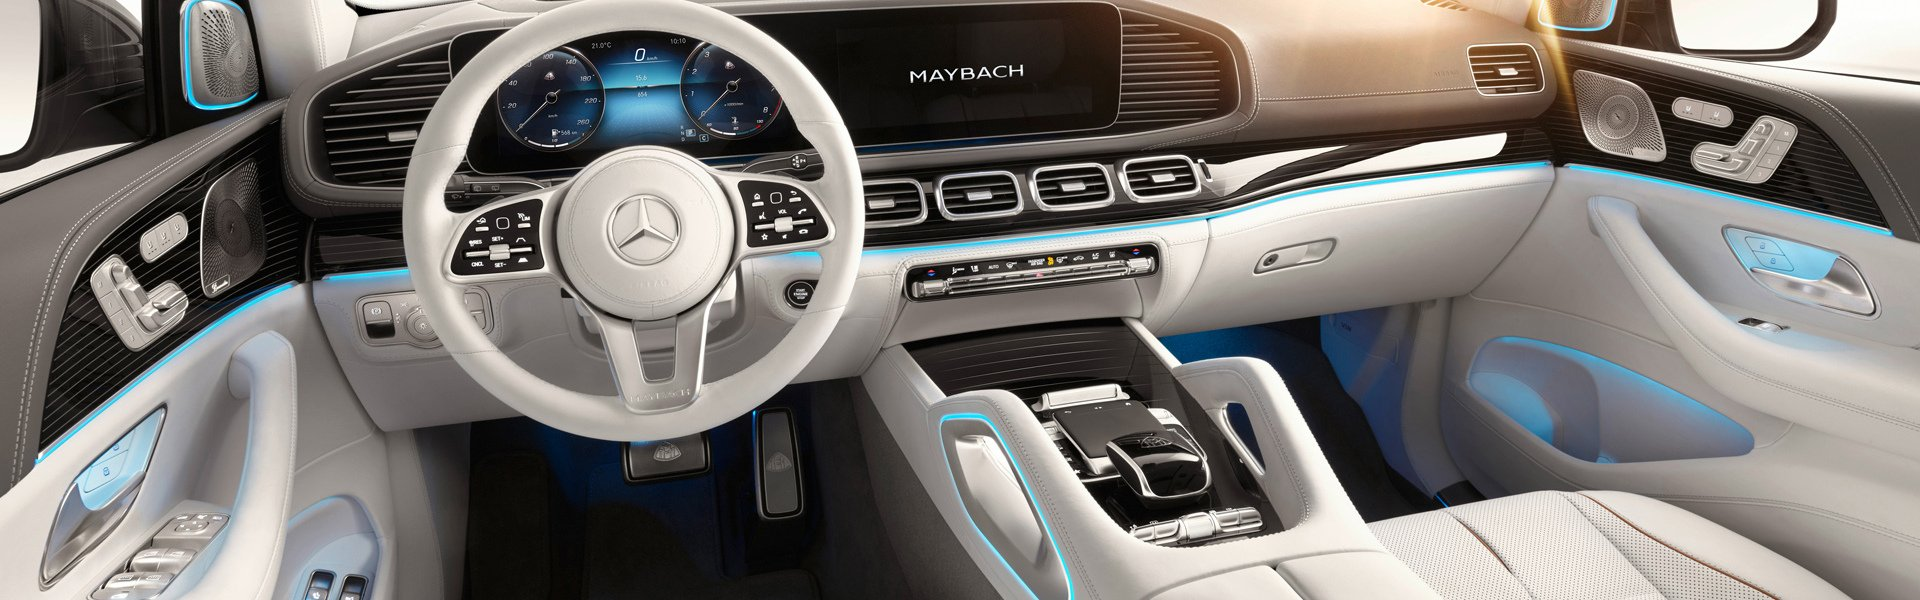 Mercedes-AMG GLS Maybach внедорожник